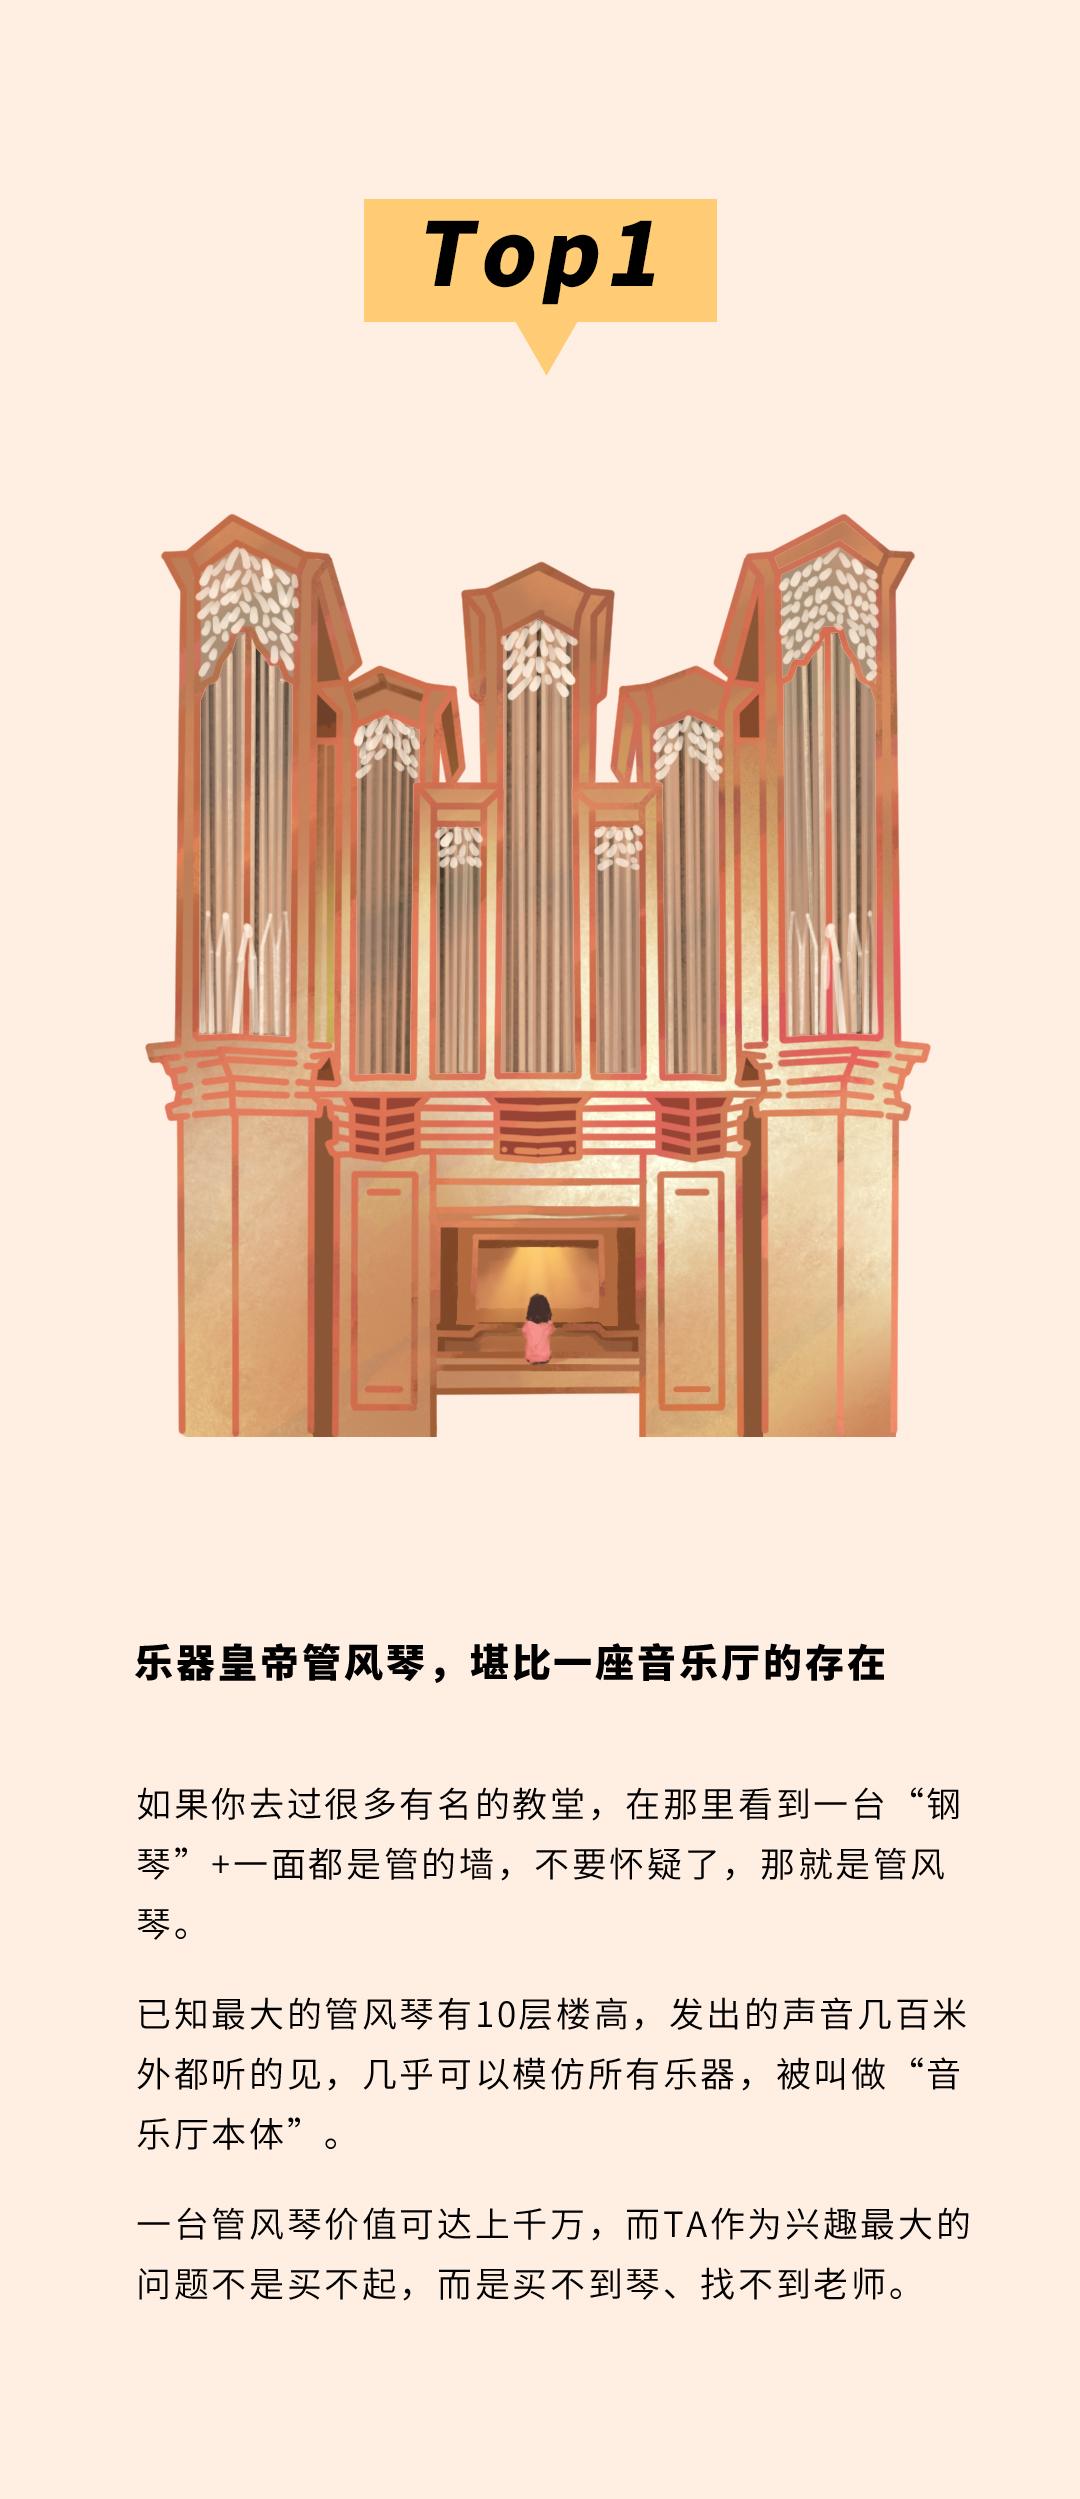 https://level8cases.oss-cn-hangzhou.aliyuncs.com/GMT微博切图1-893c8a33-38e0-4f68-bfd8-48e993768c79.jpg